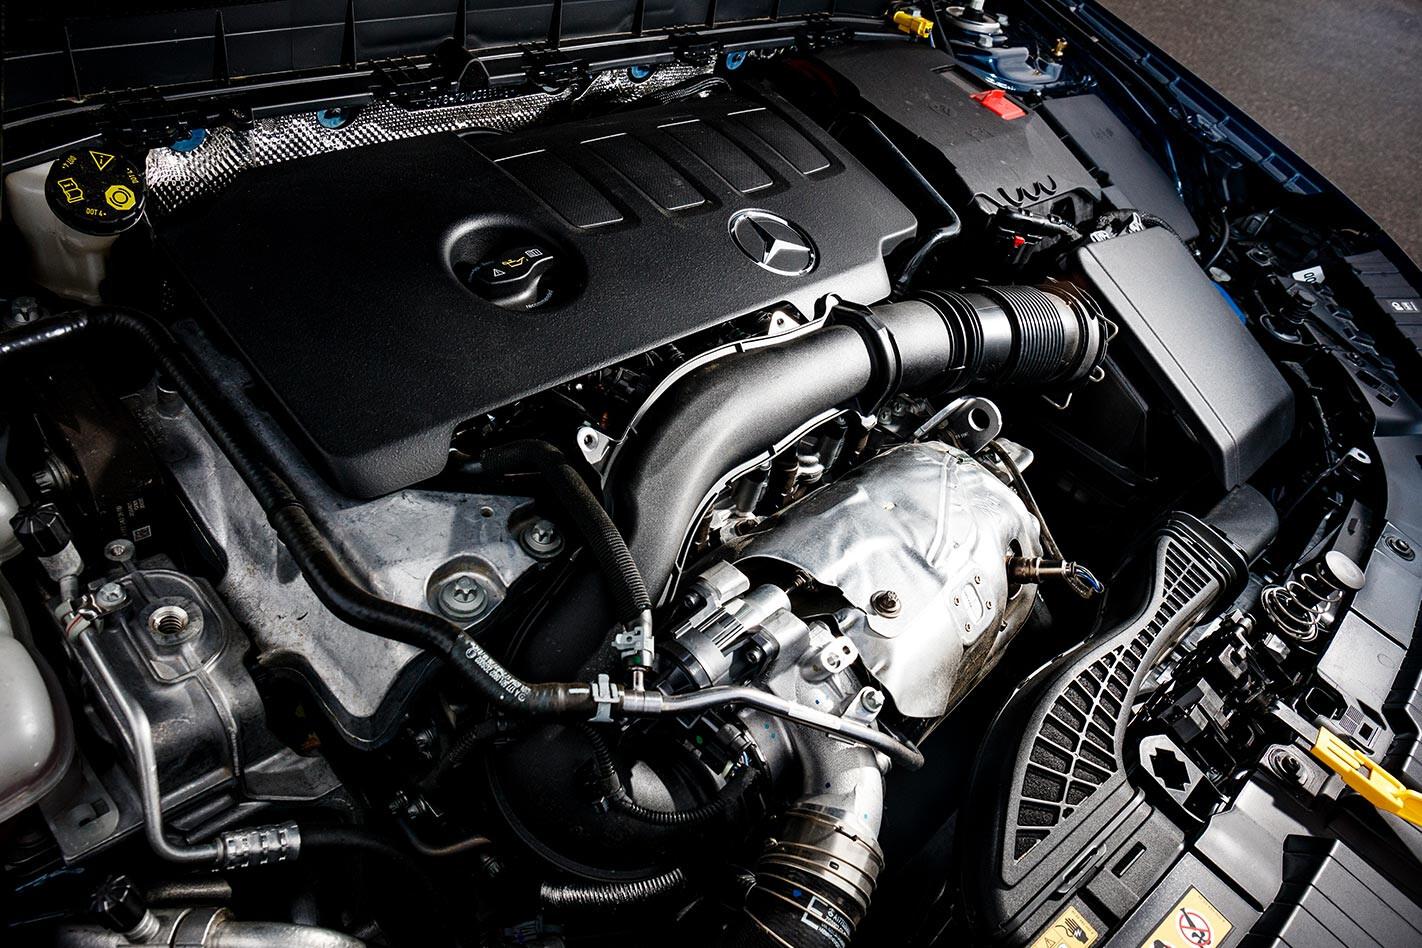 Mercedes-Benz GLB engine bay